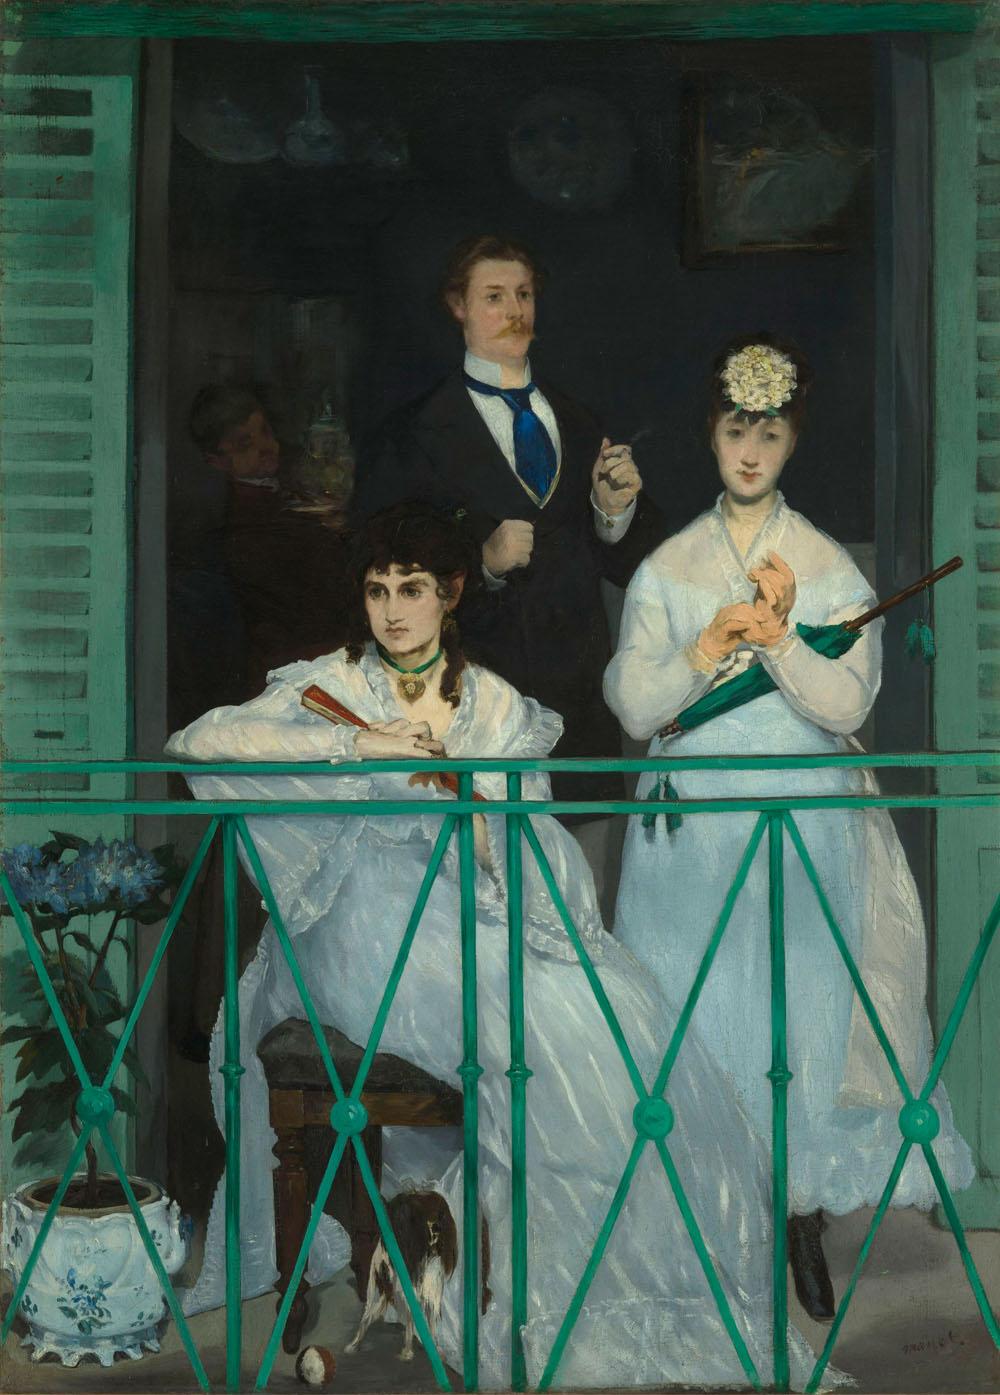 Édouard Manet (1832–1883) Le balcon / Der Balkon, um 1868/69 Öl auf Leinwand, 170 x 124,5 cm Musée d'Orsay, Paris © bpk/RMN – Grand Palais Foto: Hervé Lewandowski